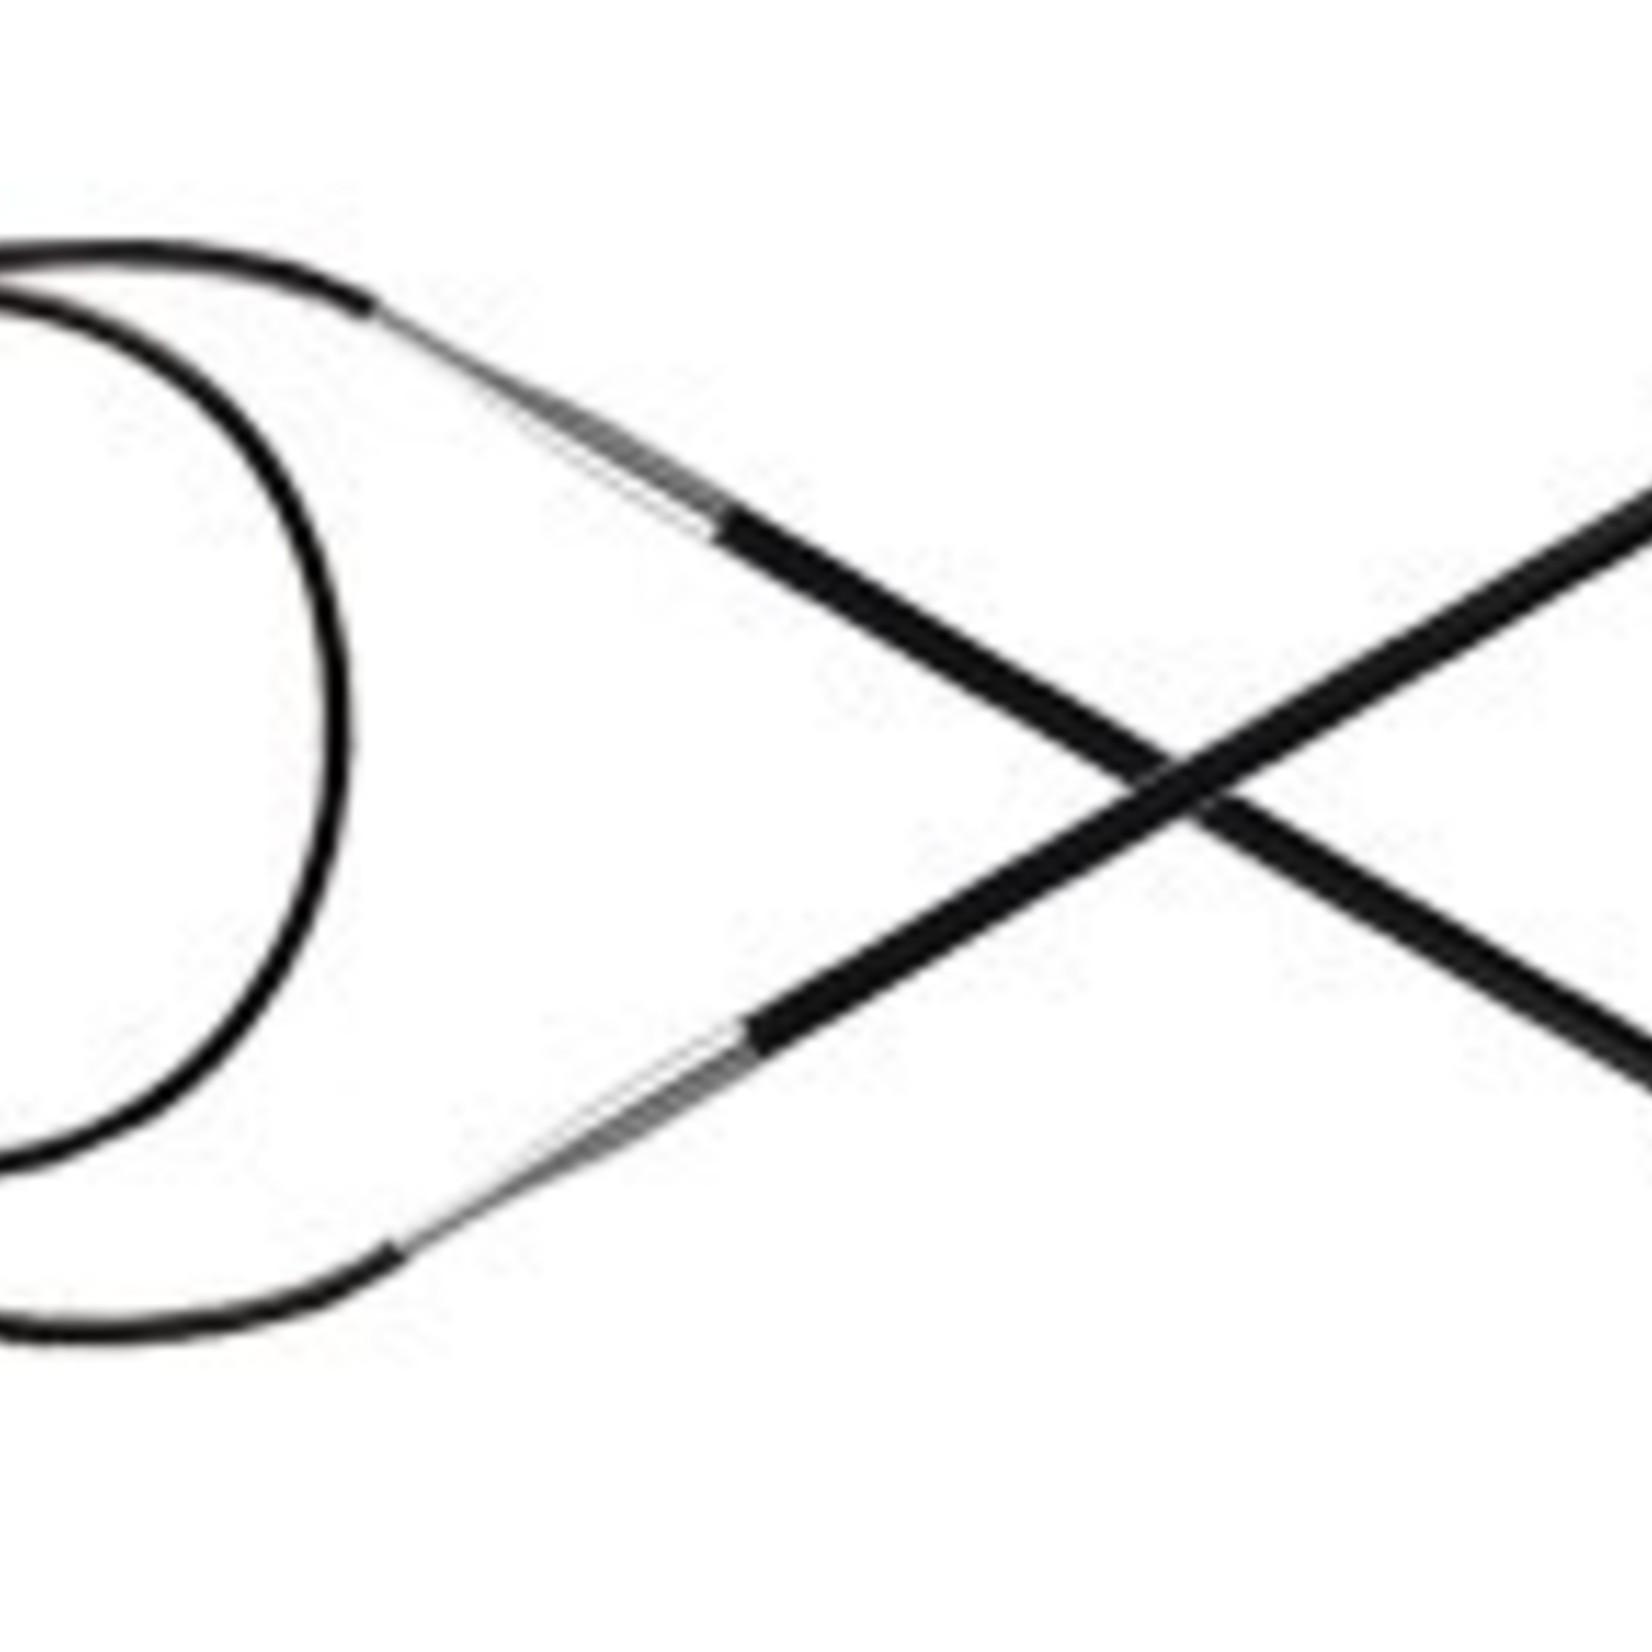 Knitter's Pride 7 Karbonz Circular 40